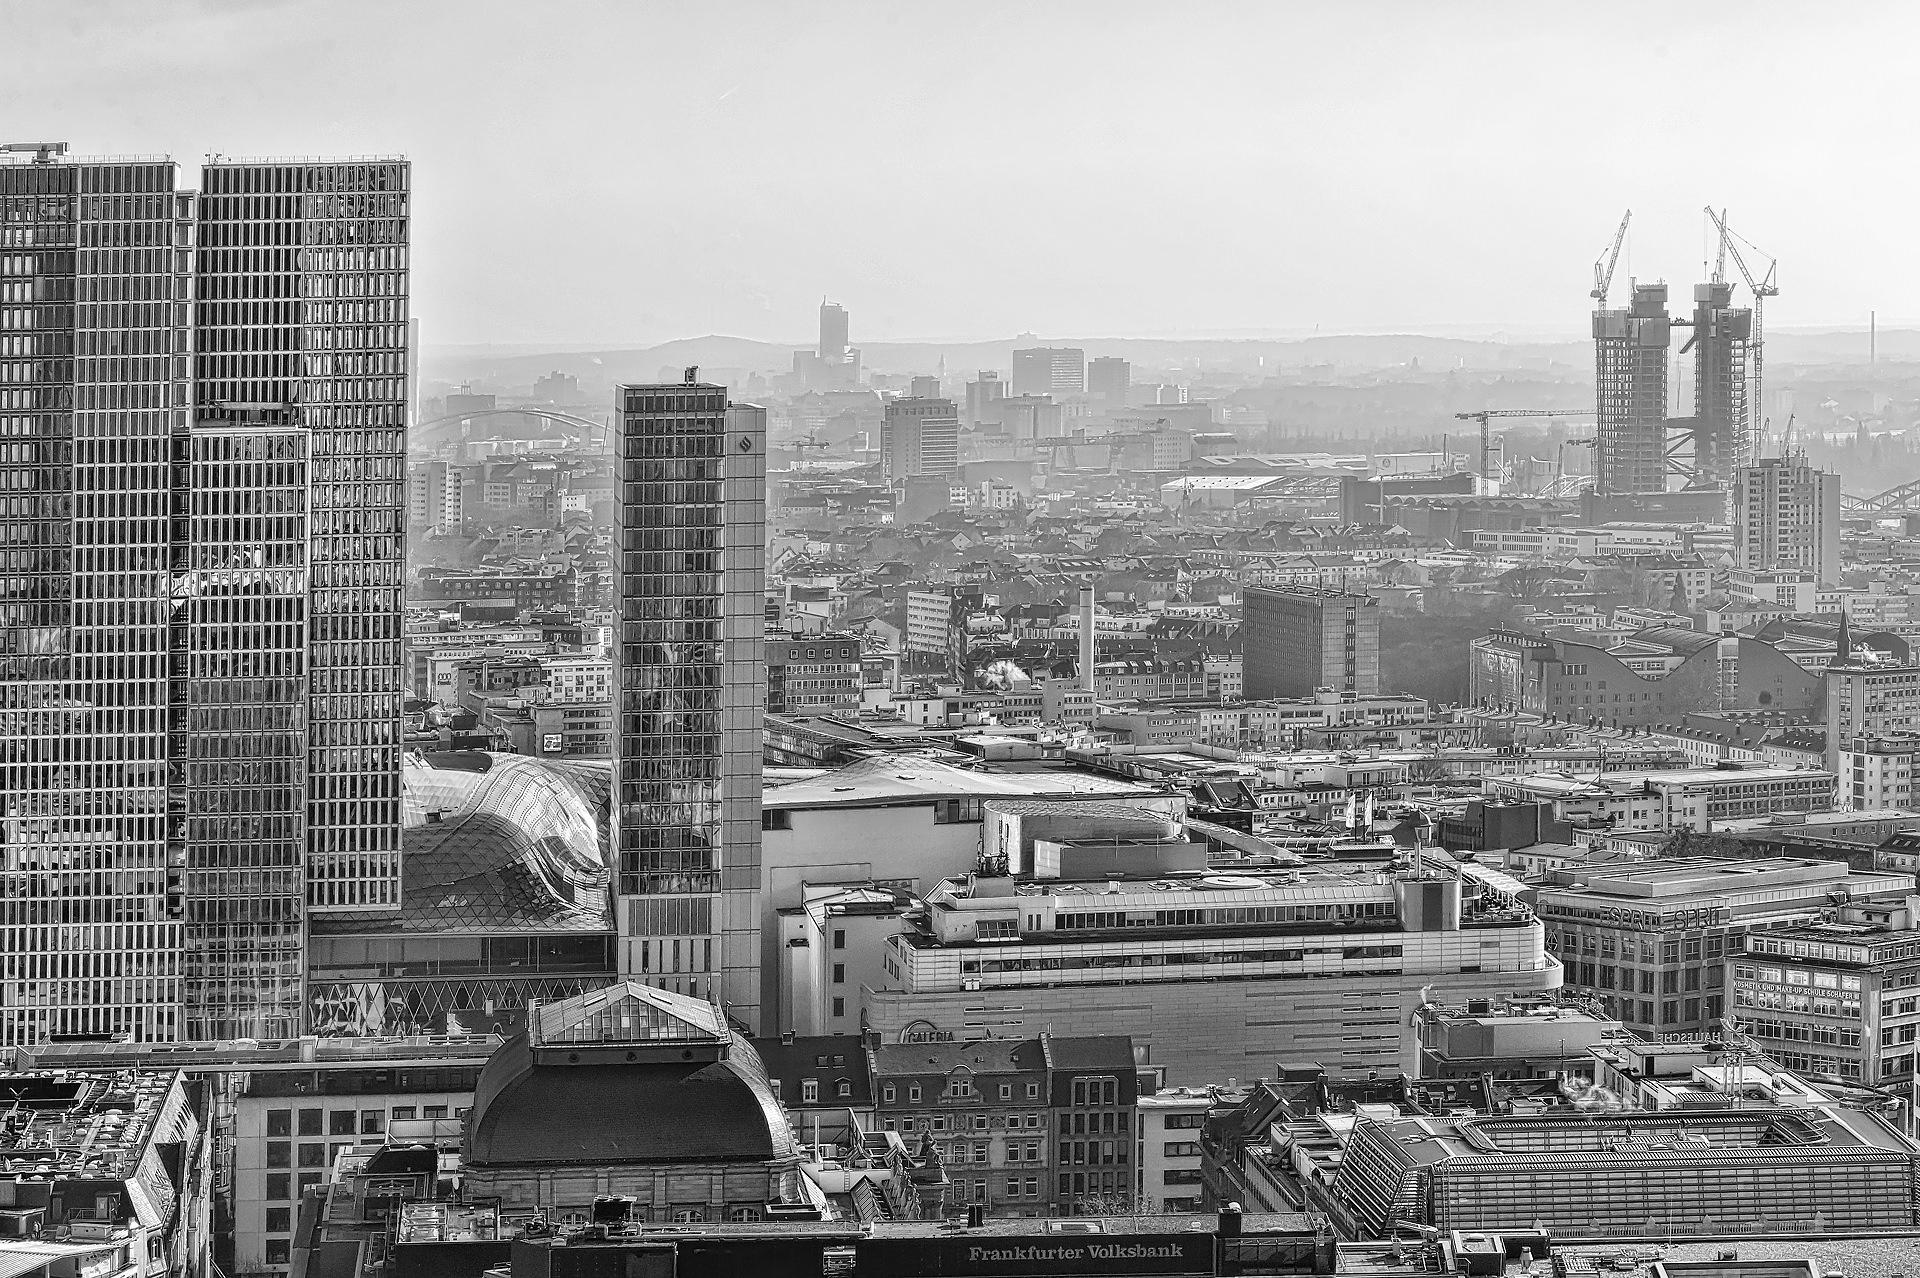 Frankfurt-©Michael-Kleinespel-15.JPG